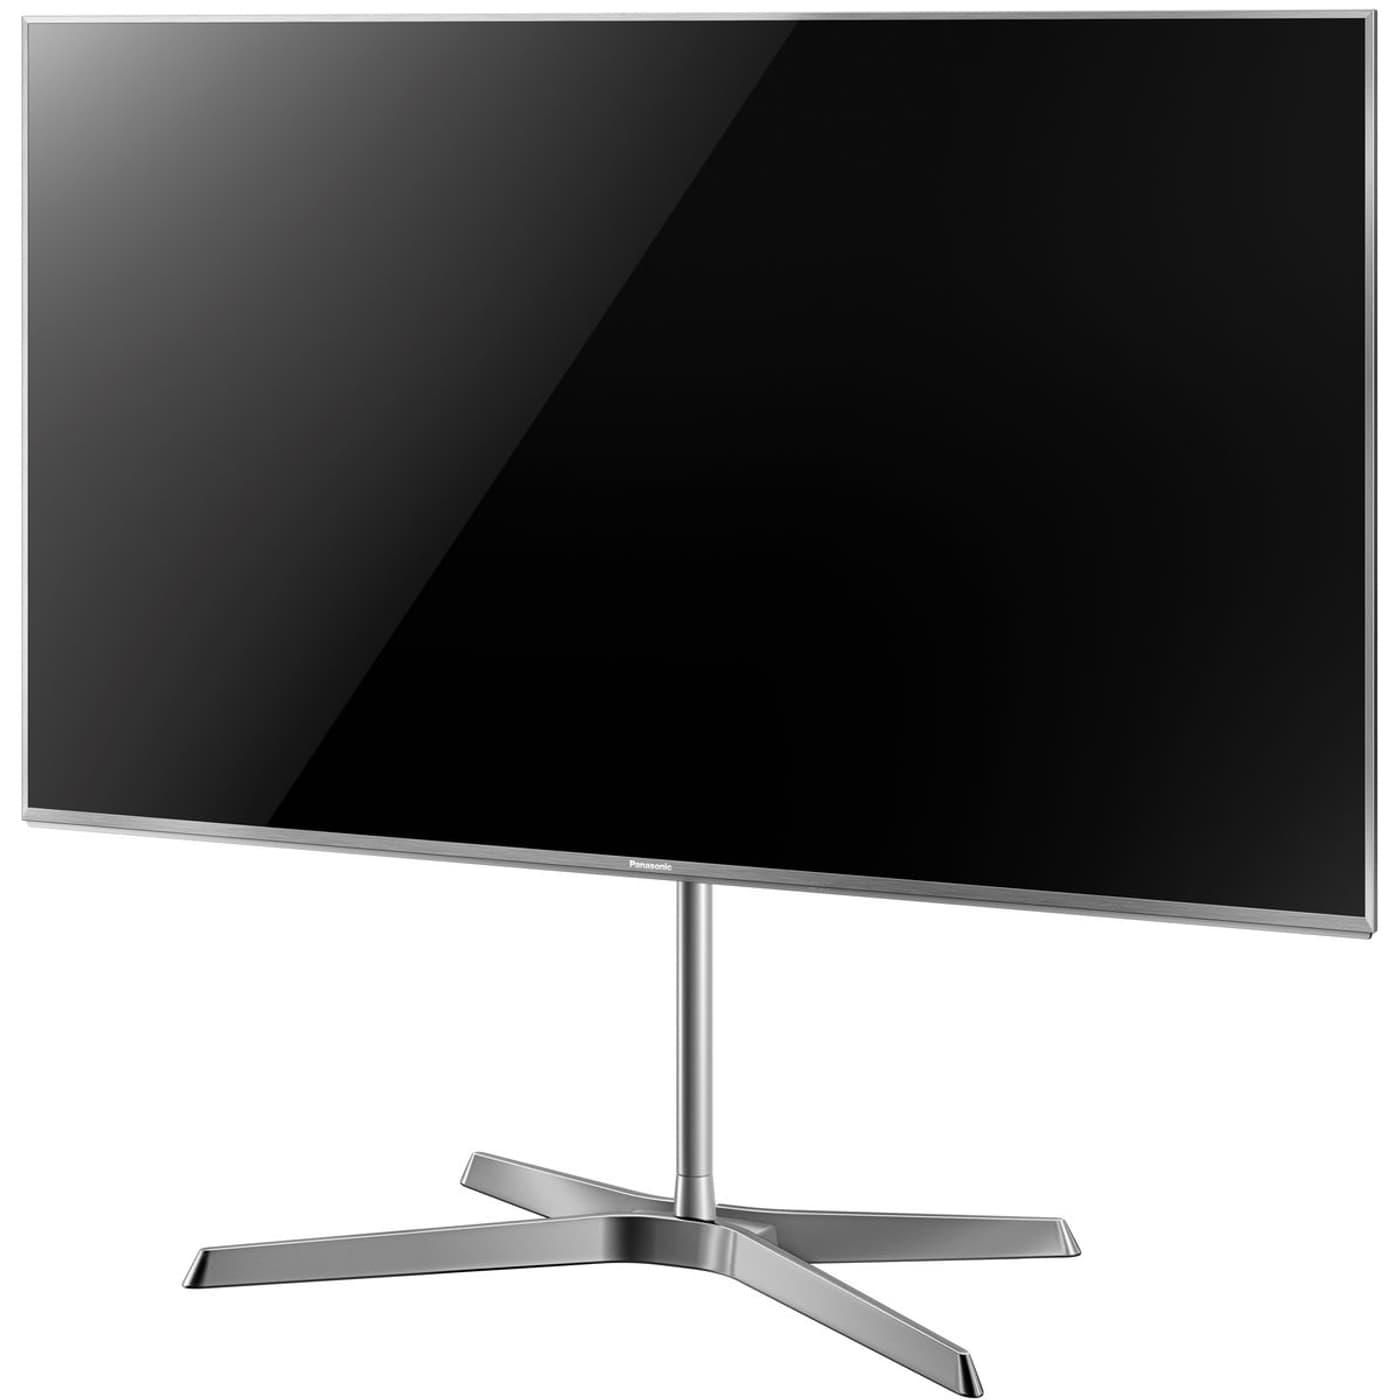 panasonic tx 58exw784 146 cm 4k fernseher migros. Black Bedroom Furniture Sets. Home Design Ideas